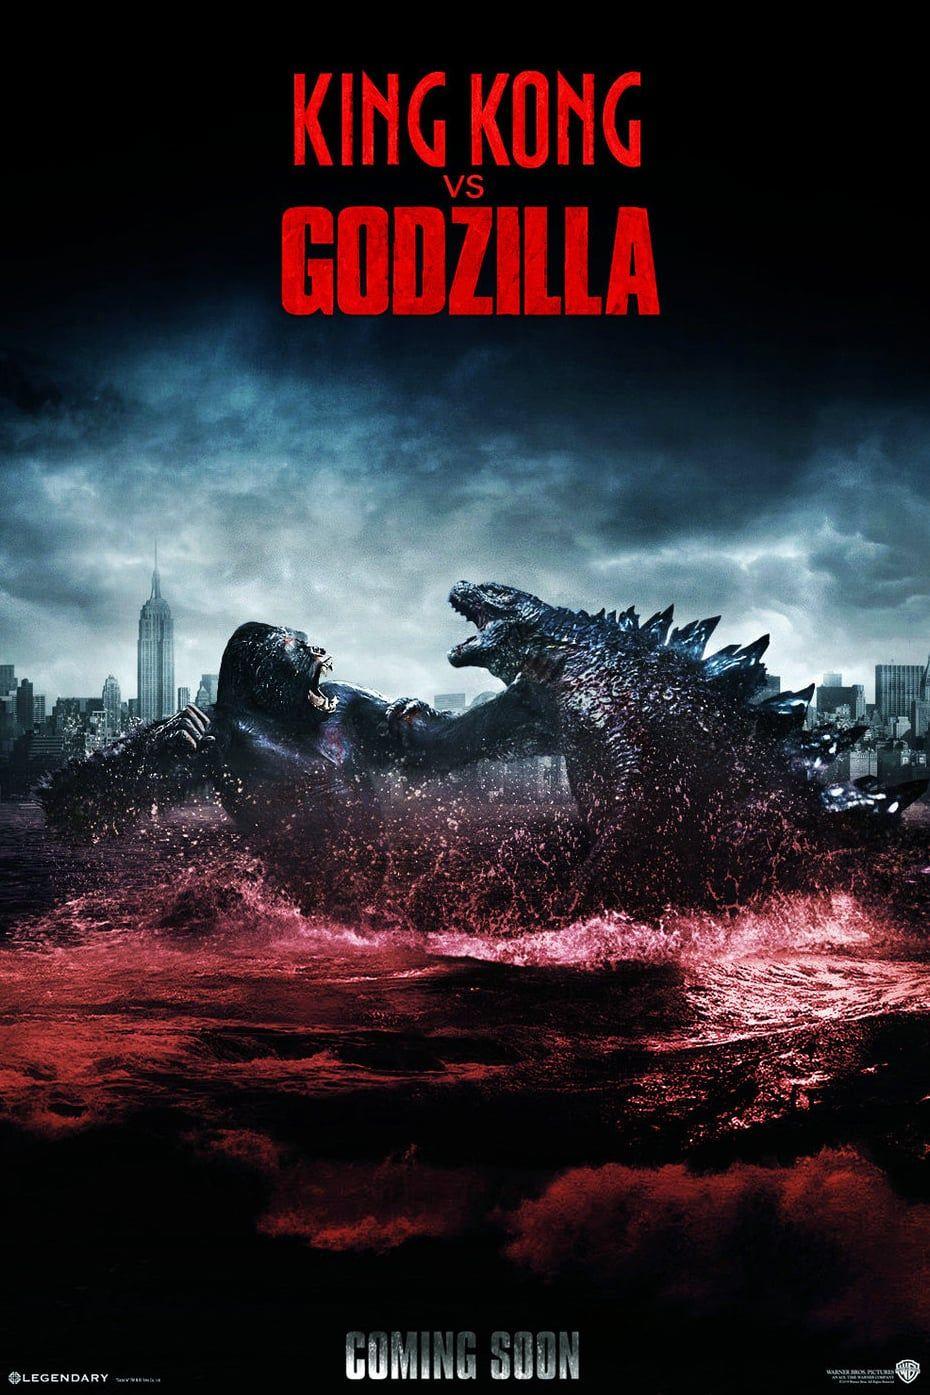 Godzilla Vs Kong Streaming Vf Complet En Ligne Gratuite Streaming Vf Godzilla Godzilla Vs Streaming Movies